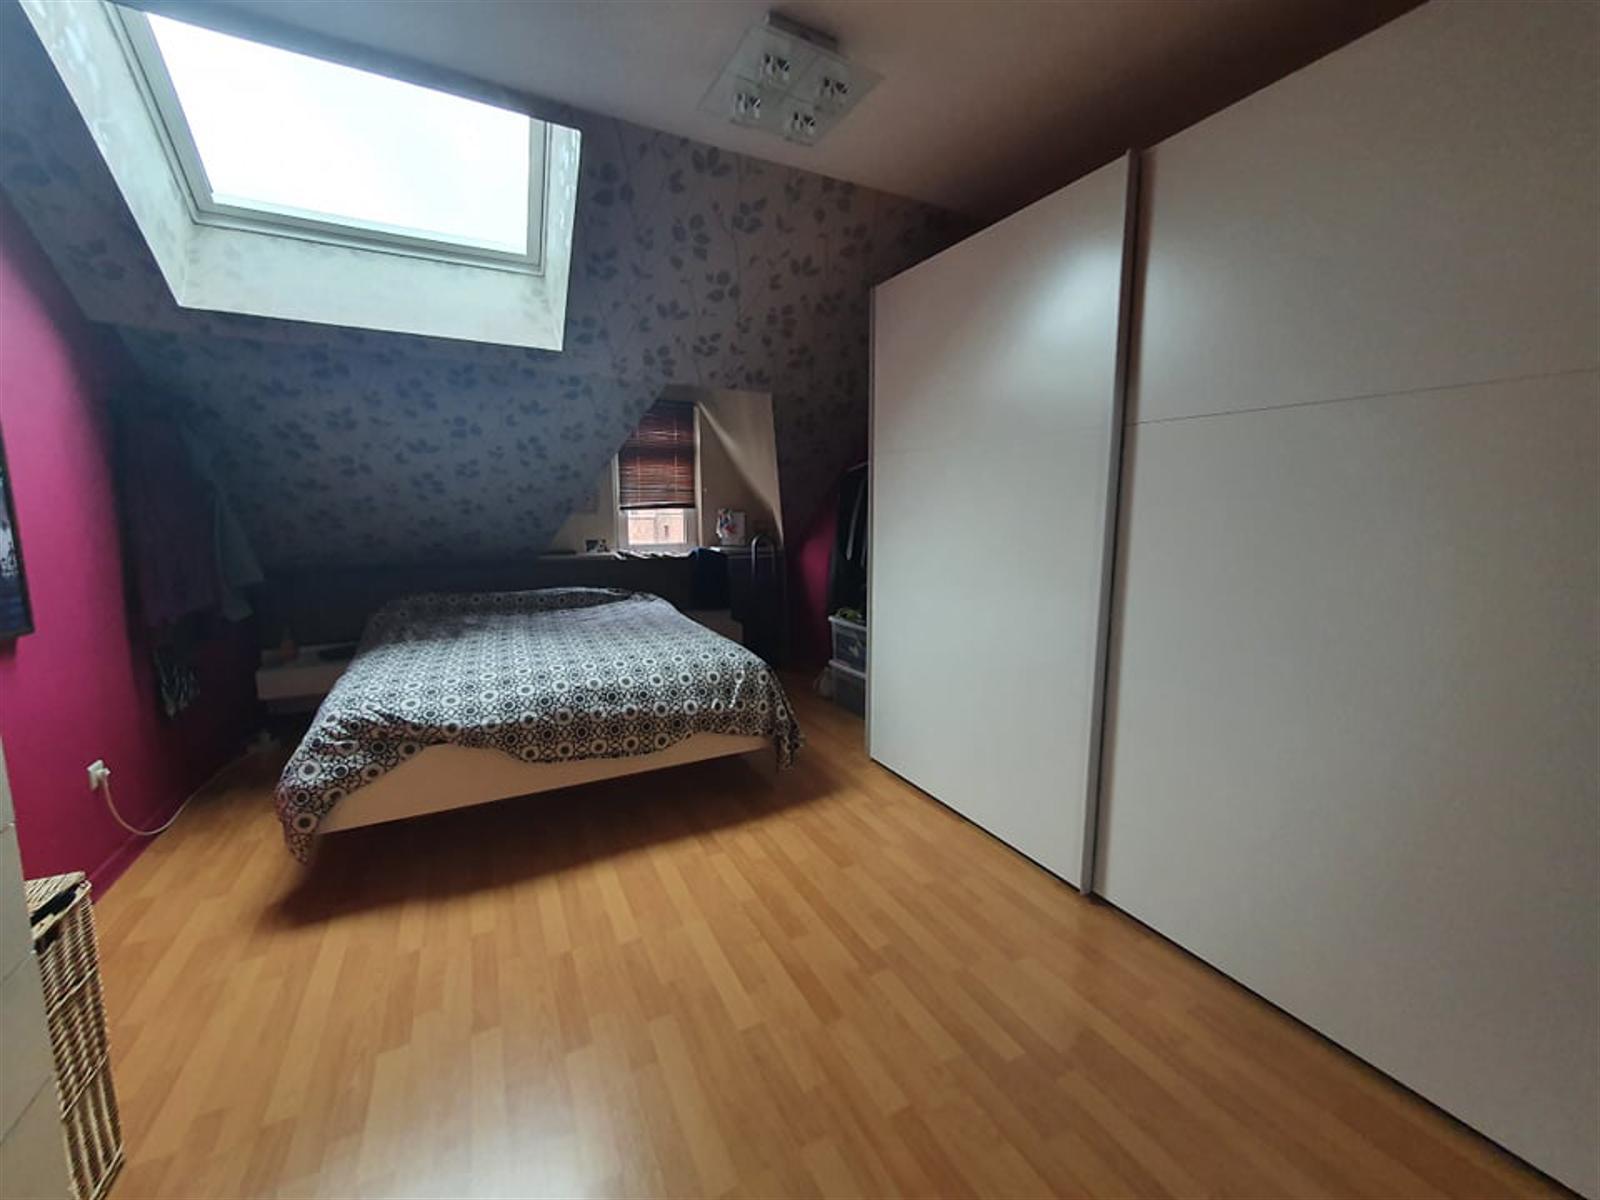 Duplex - Le Roeulx - #4535898-9